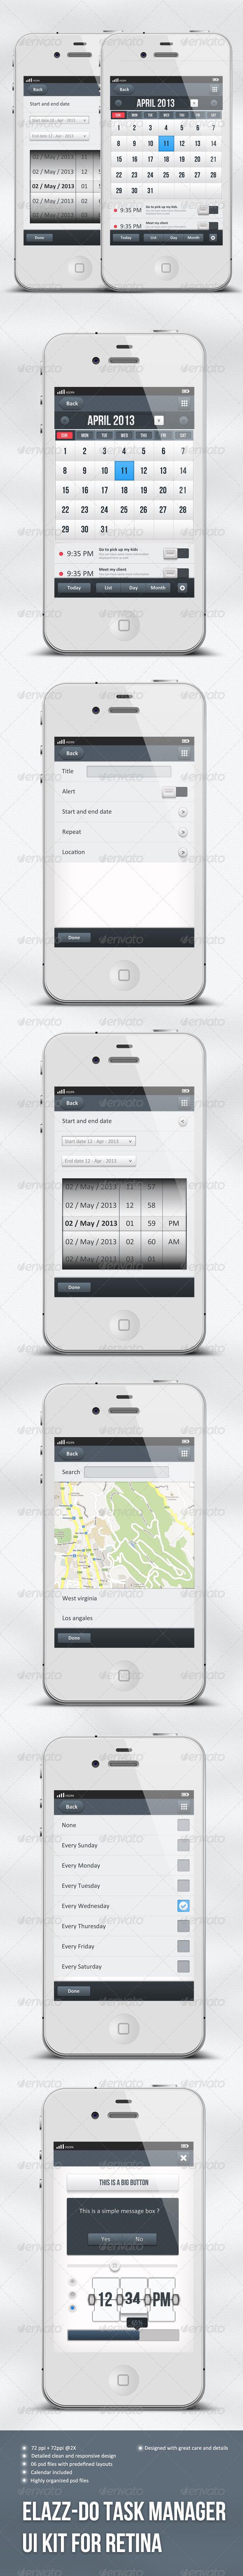 IOS Task Manager App Ui - Elazz-Do - User Interfaces Web Elements